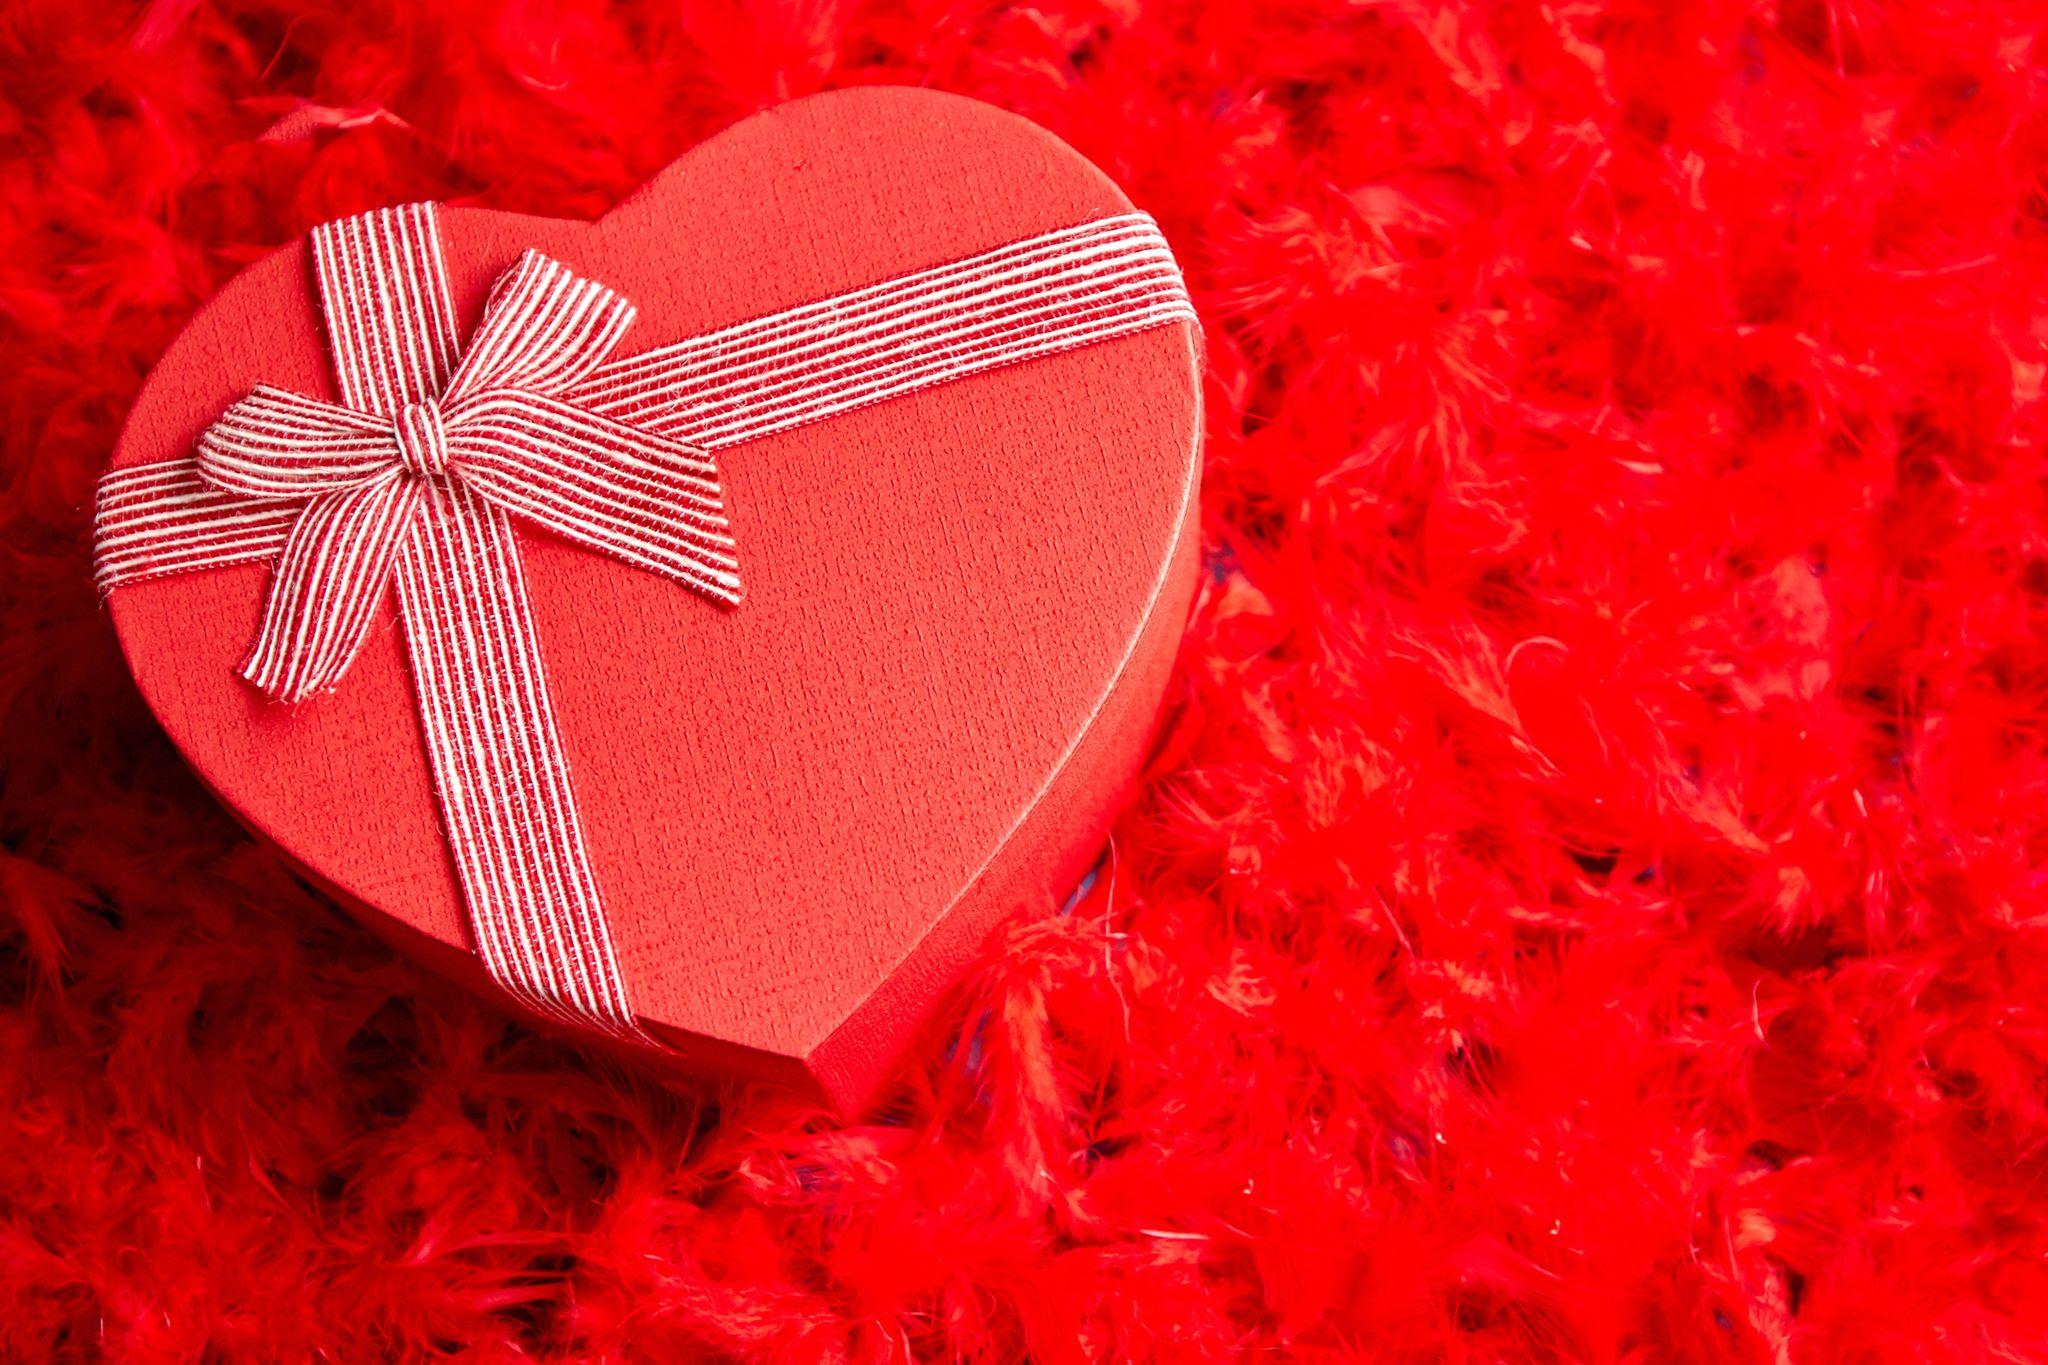 Valentines day images 13 صور عيد الحب